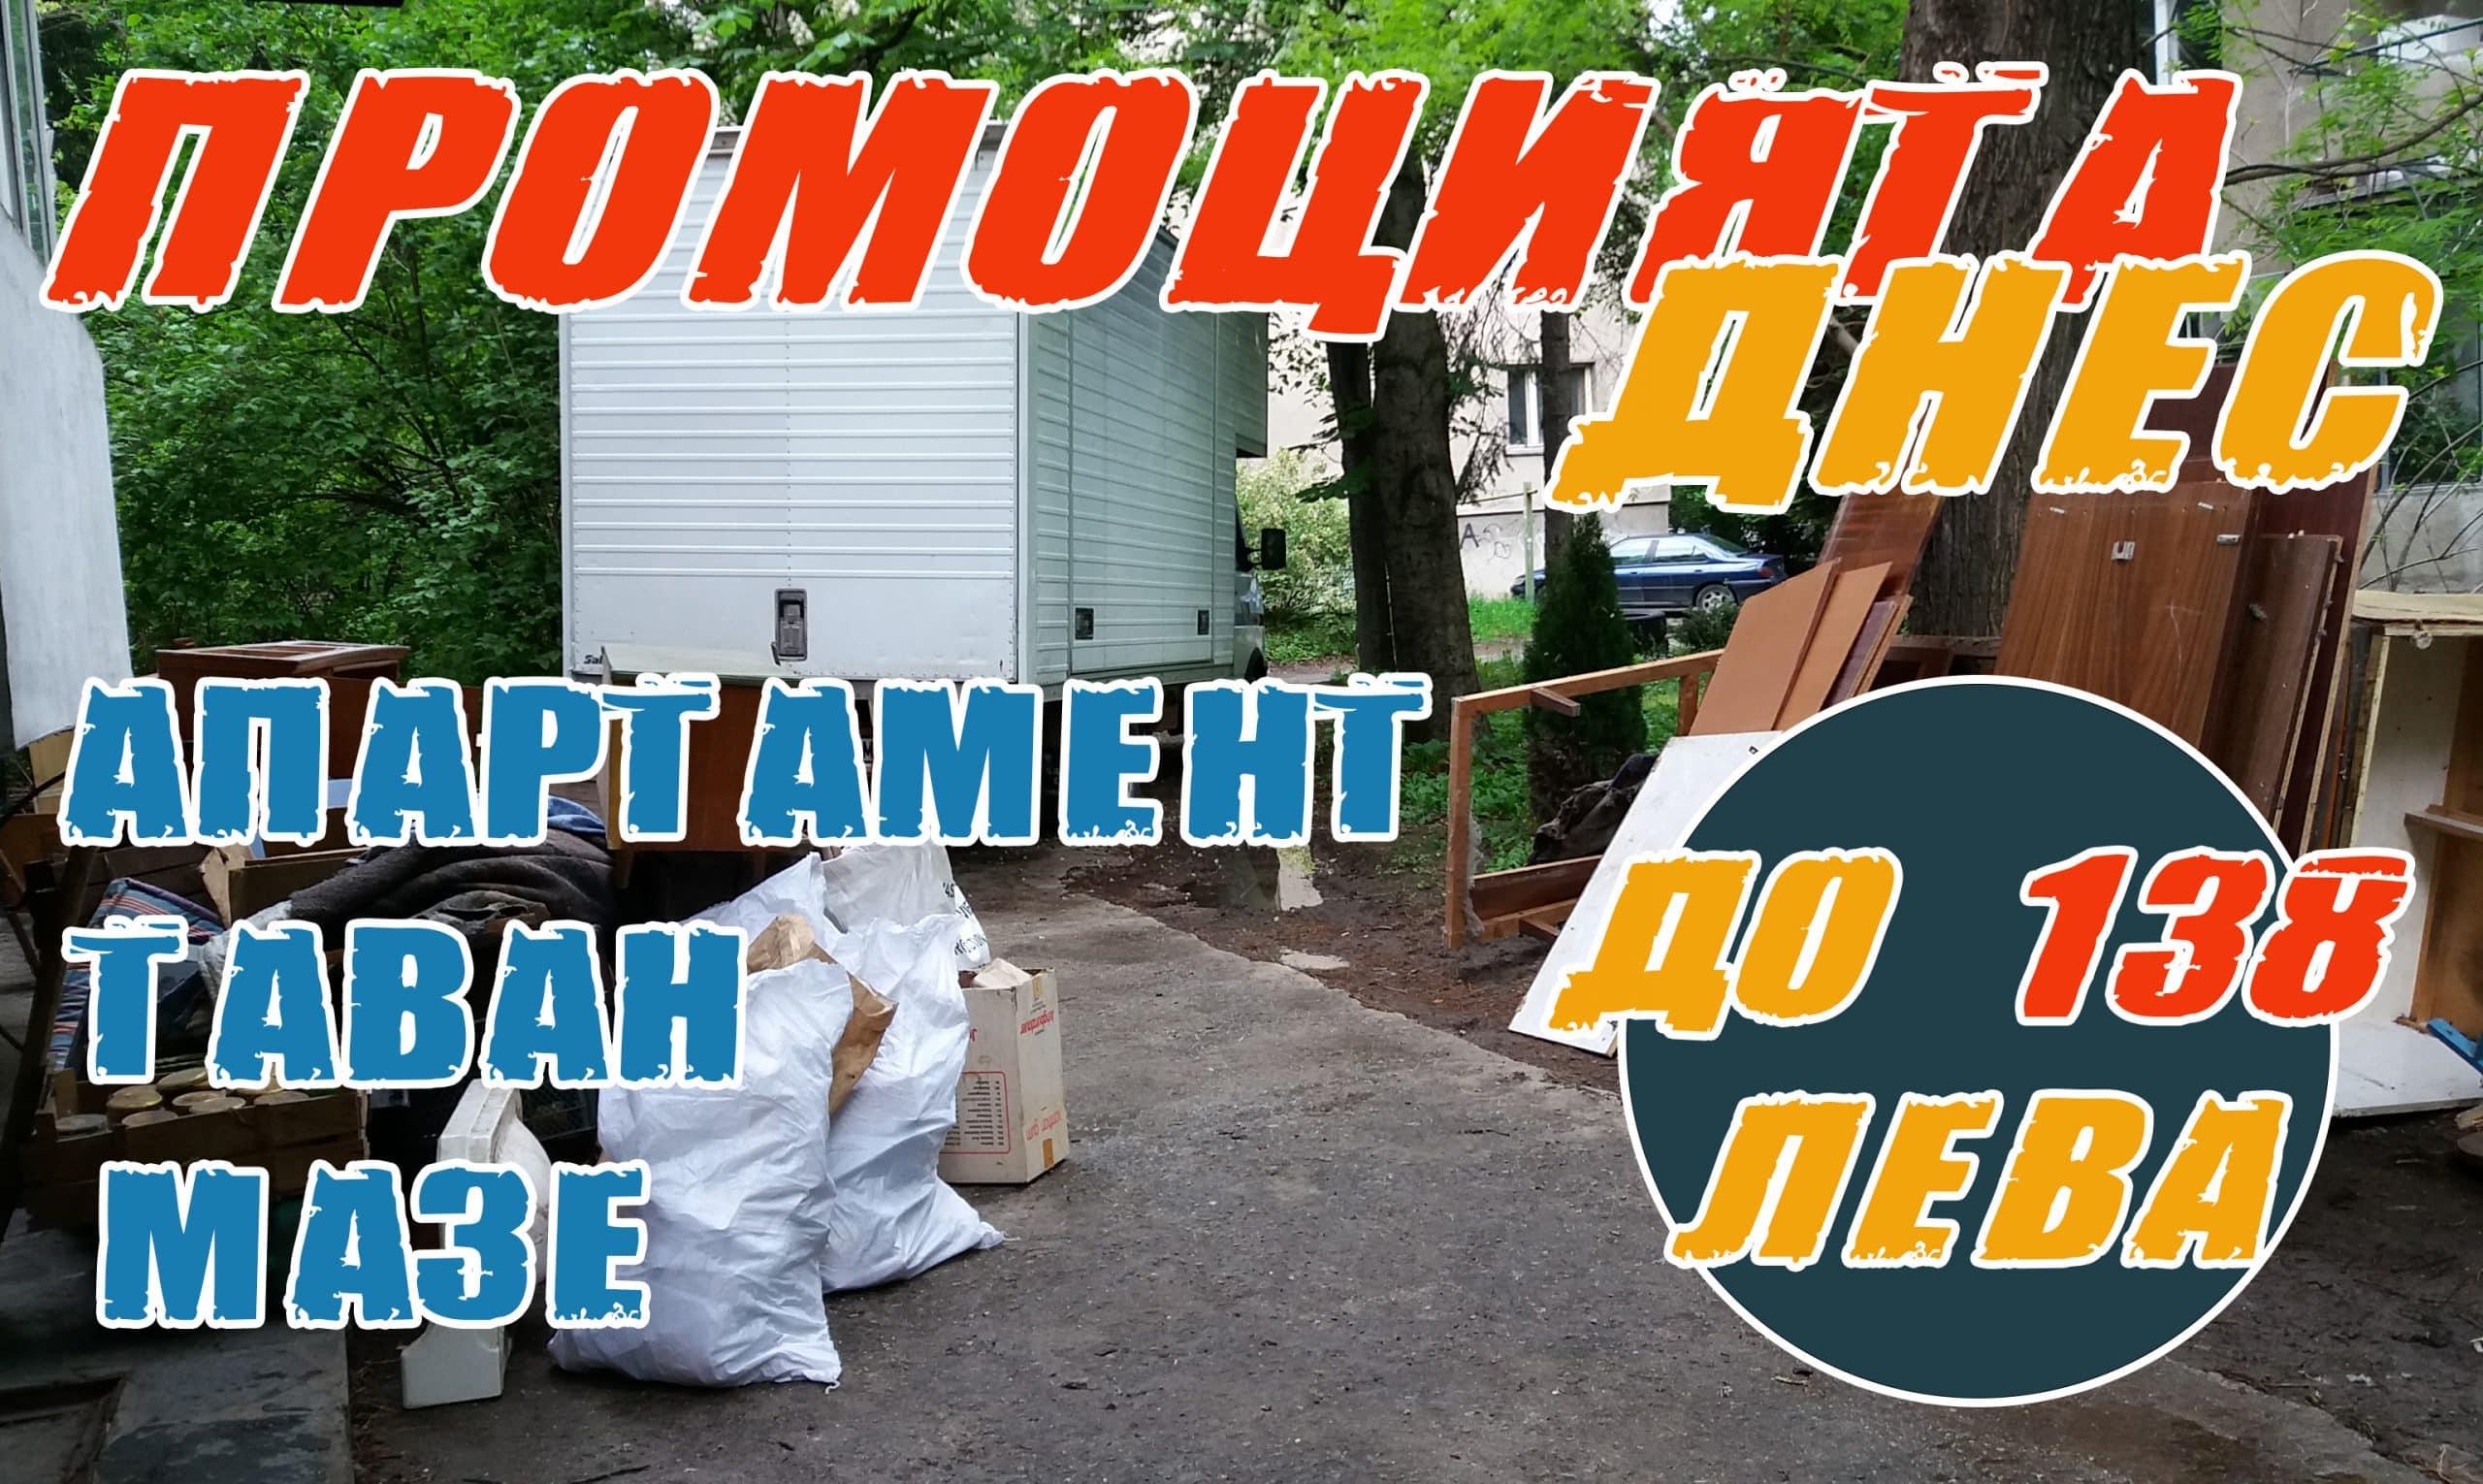 Фирма за почистване на апартамент таван и мазе